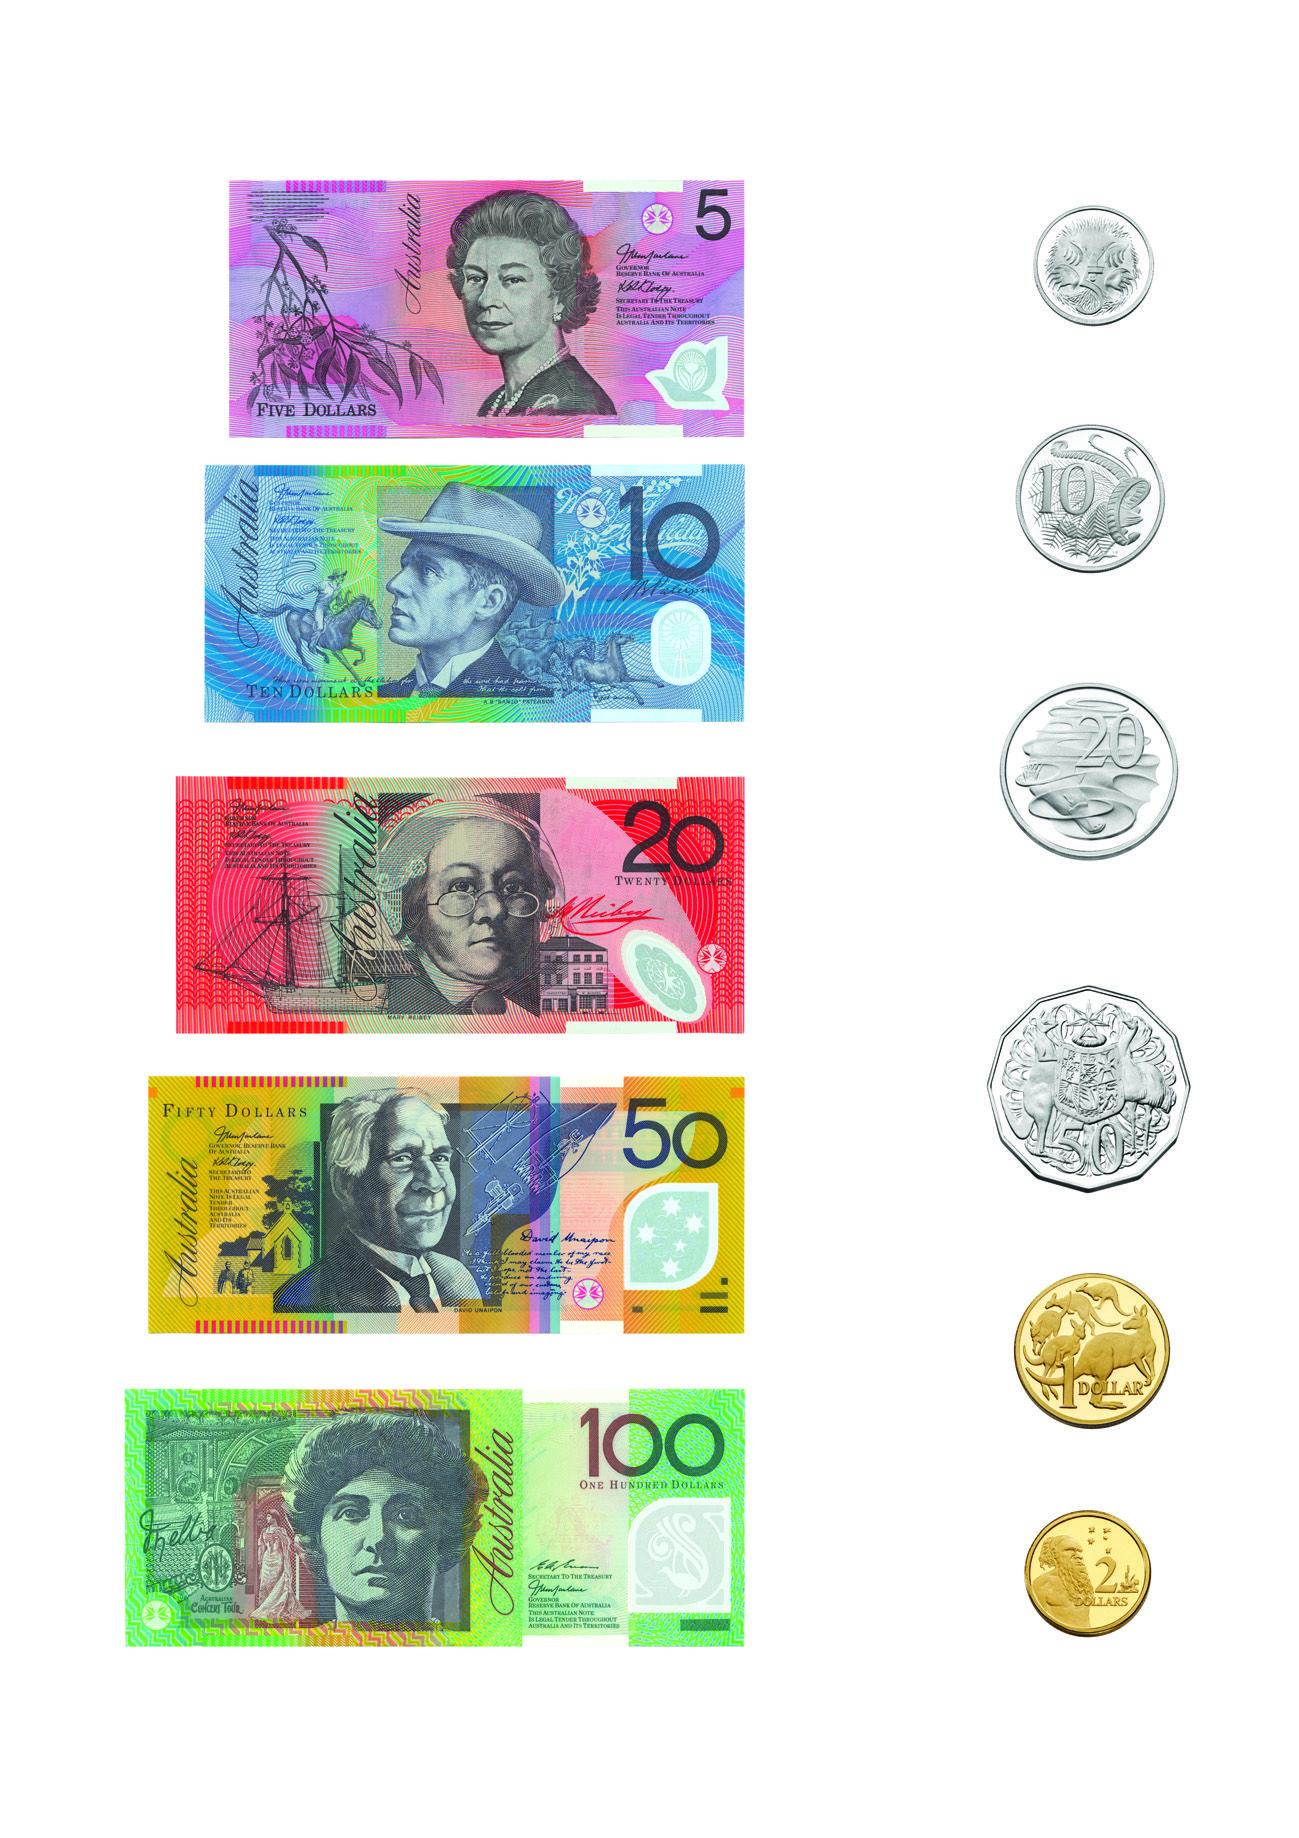 Australian Money Pictures For Print